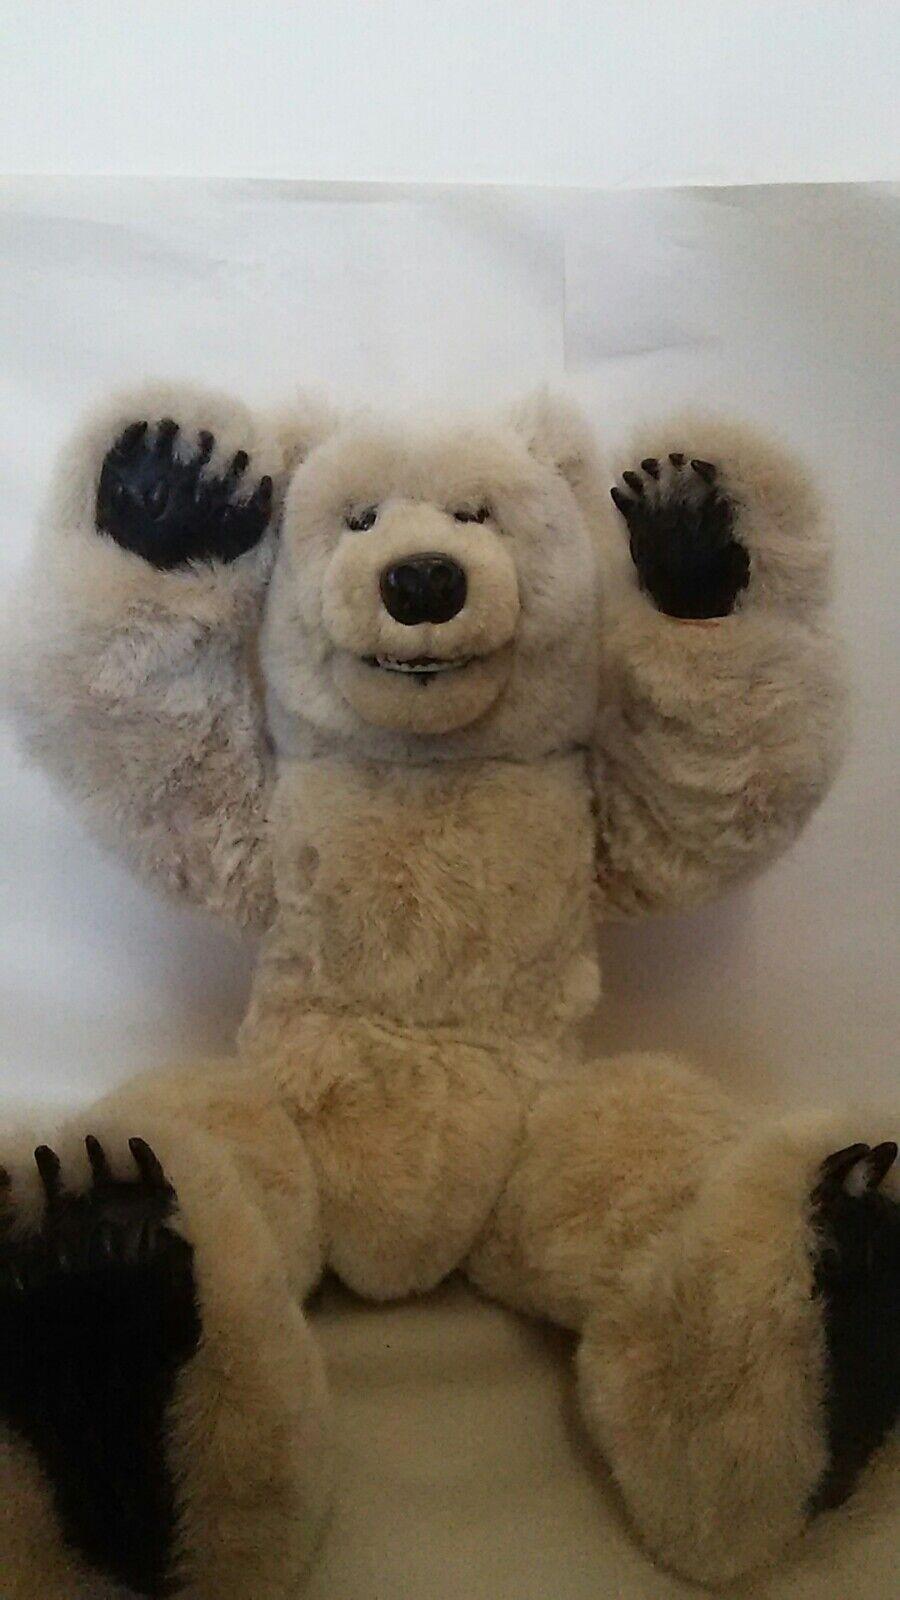 Stuffed animal Pola BEAVER VALLEY Young Pola animal Bear 18/100 1989 Kaylee Nilan f9d387